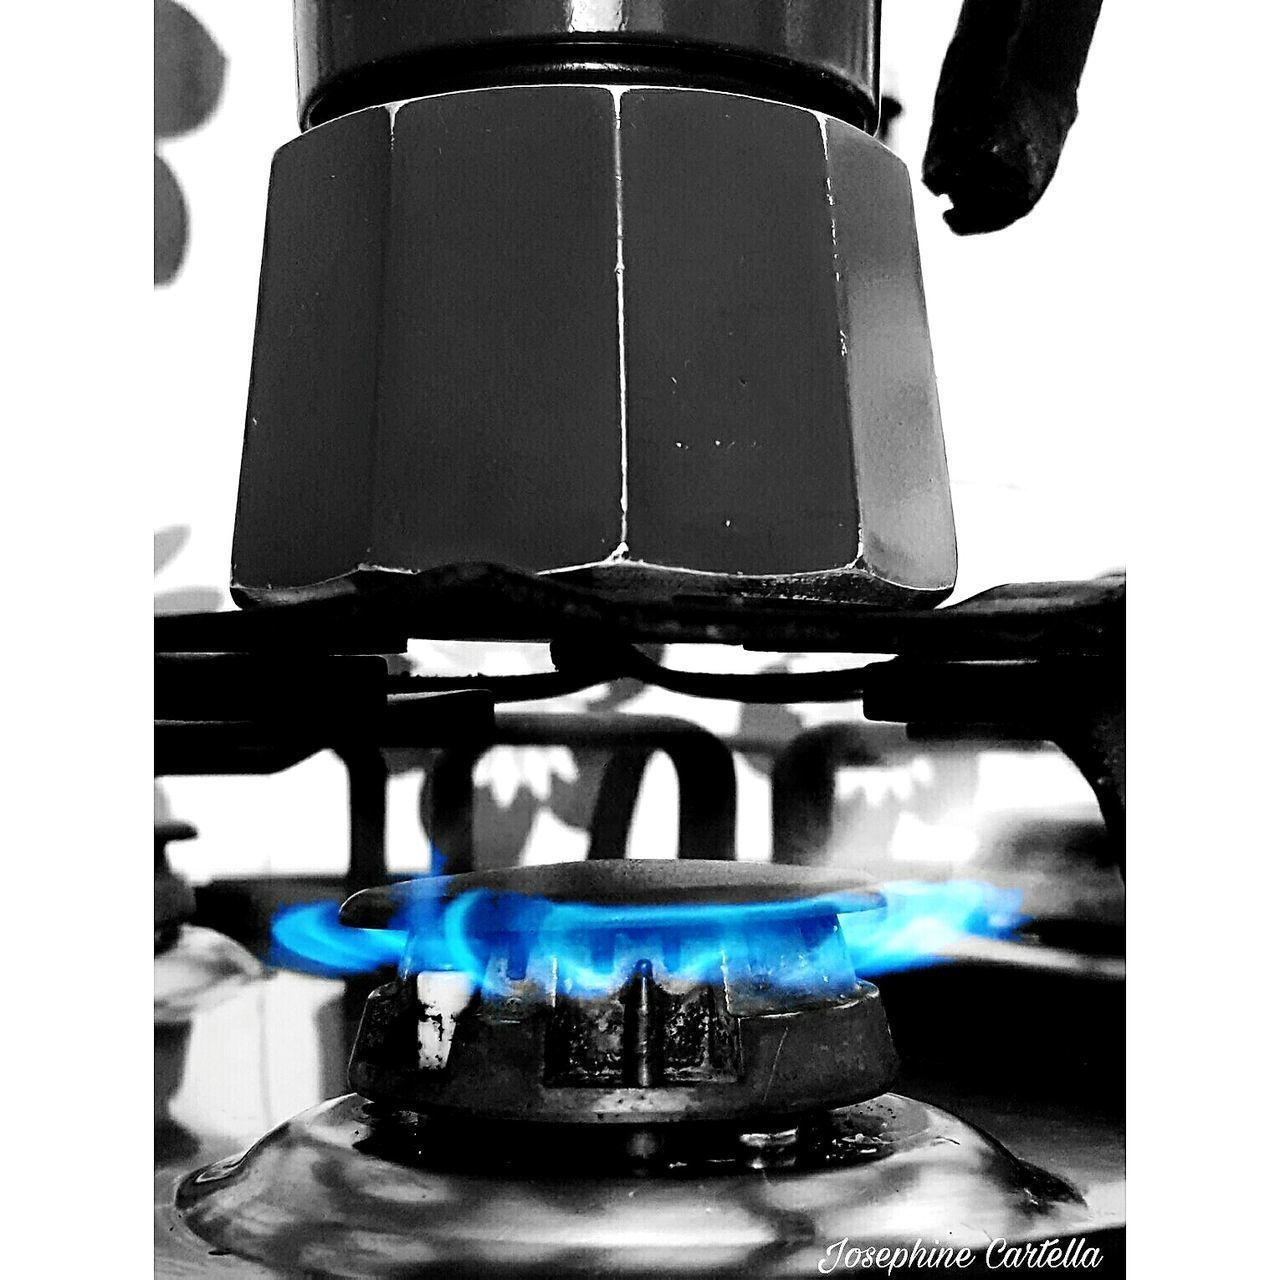 Caffè Caffeine Caffe Time Caffeineaddict Caffee Caffe Nero Caffeitalia Italy🇮🇹 Italia Fire Photography Photooftheday Photo Gas Technology Day Photograph Colori Blackandwhite Black Blue Coffee - Drink Happymoments Love Dontworry